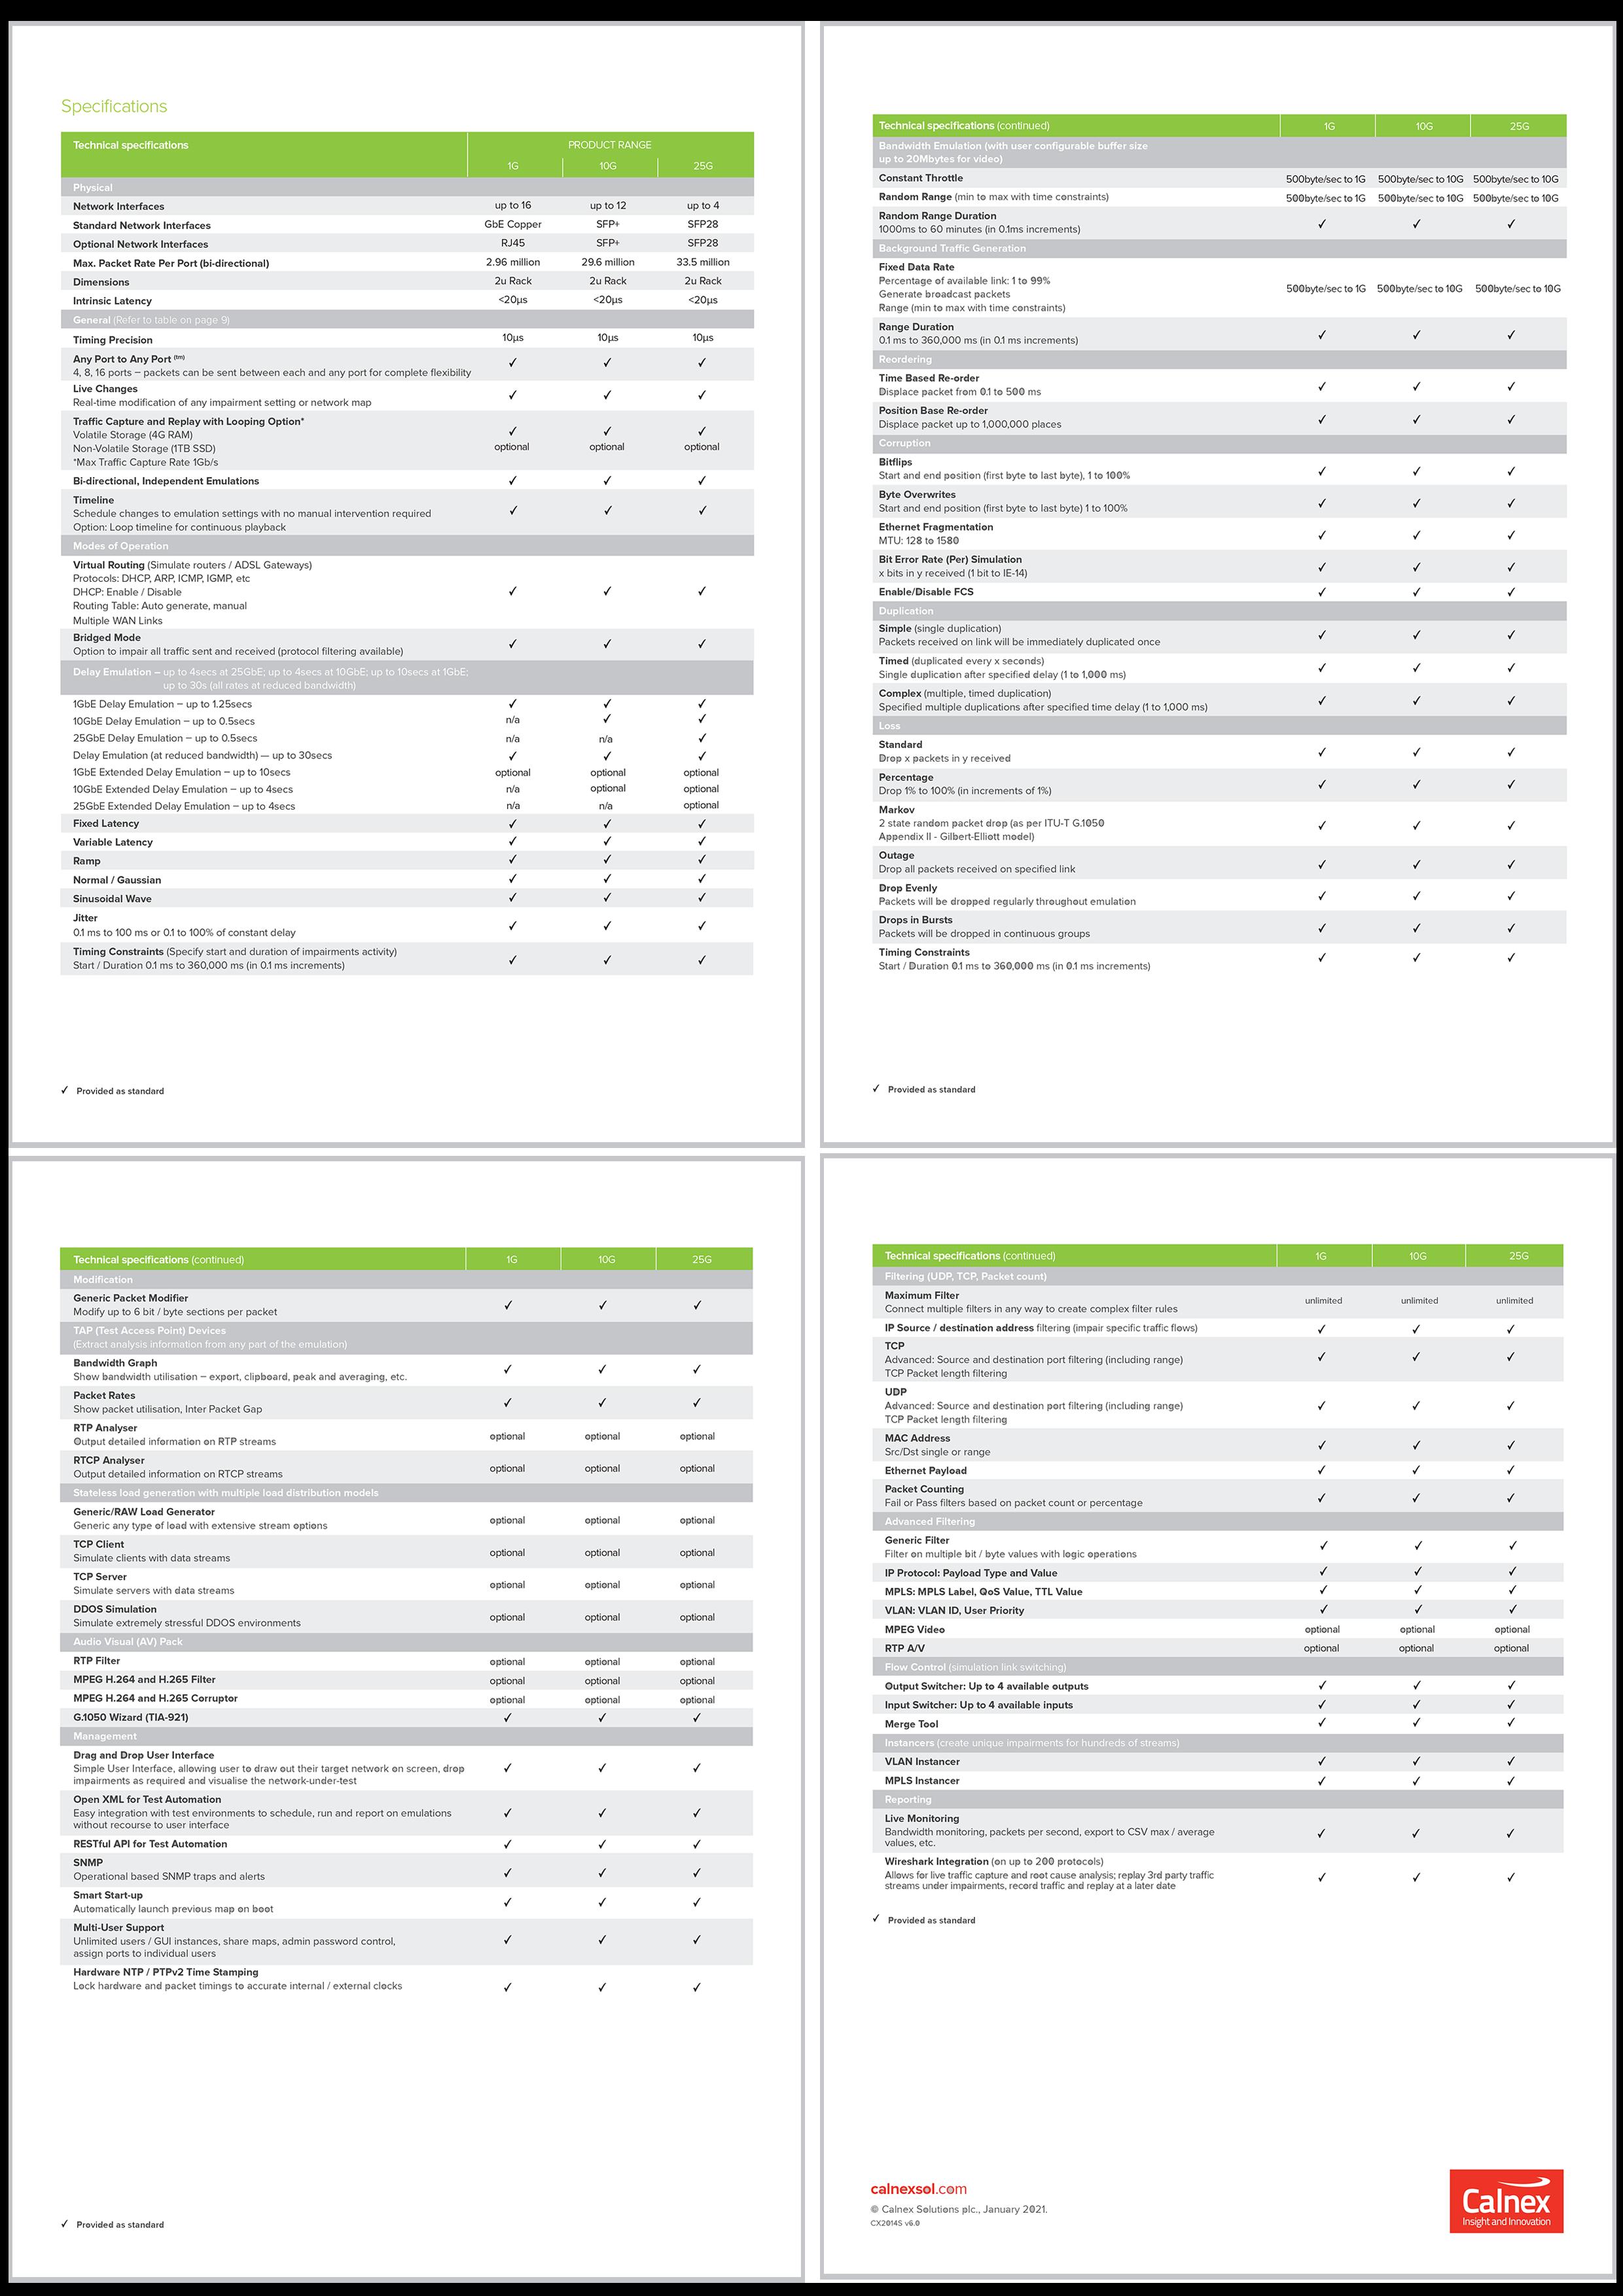 Calnex SNE specifications